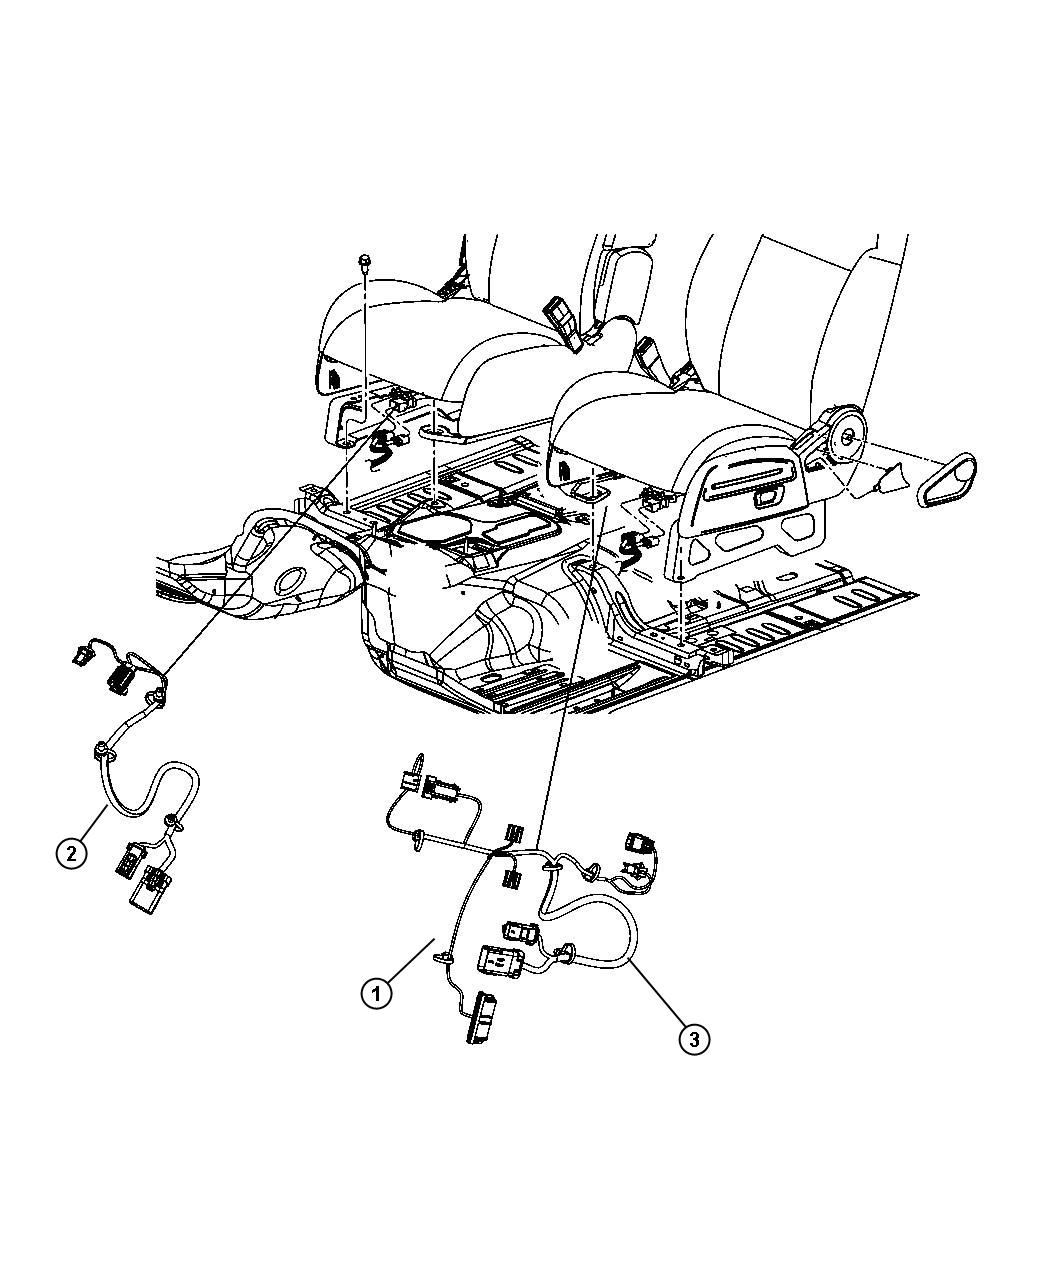 Dodge Nitro Wiring Power Seat Left 6 Way Power 6 Way